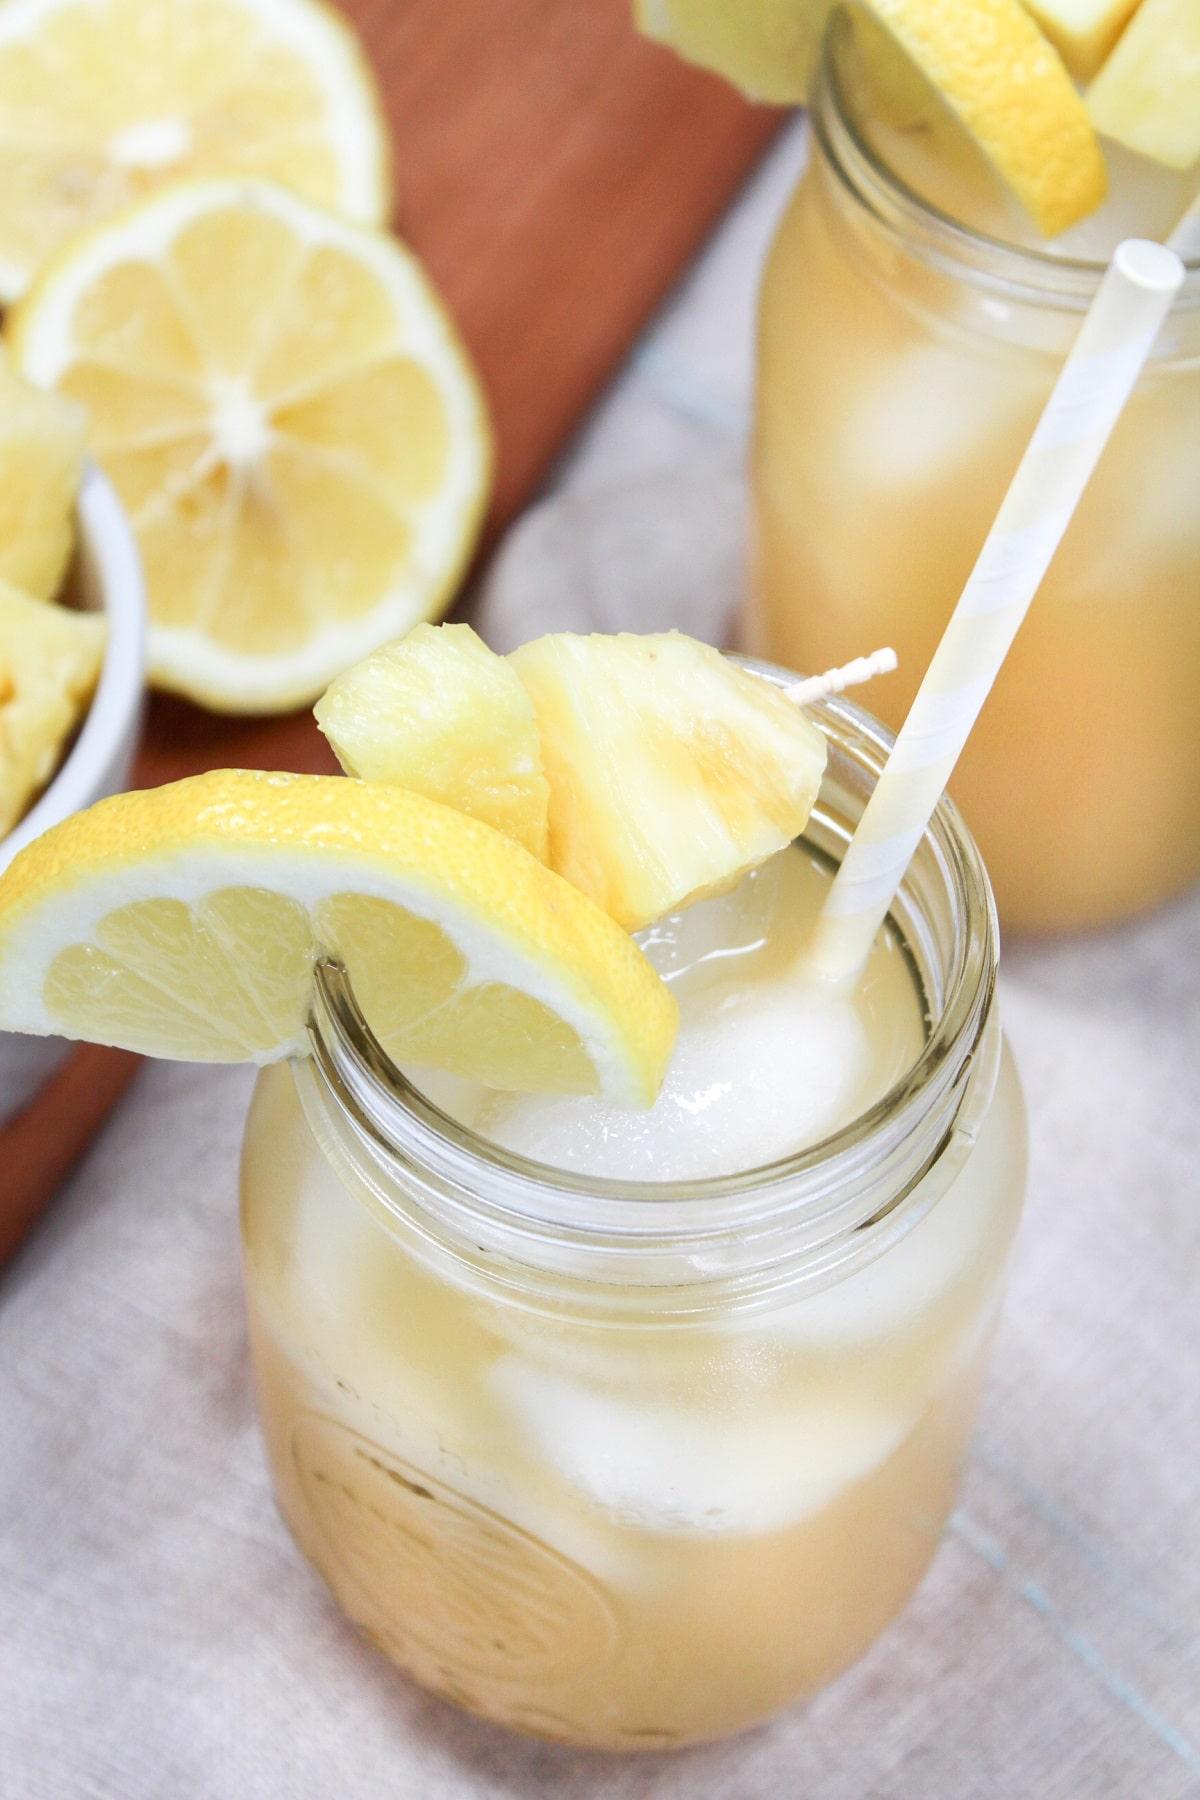 pineapple bourbon lemonade in glass with pineapple and lemon garnish